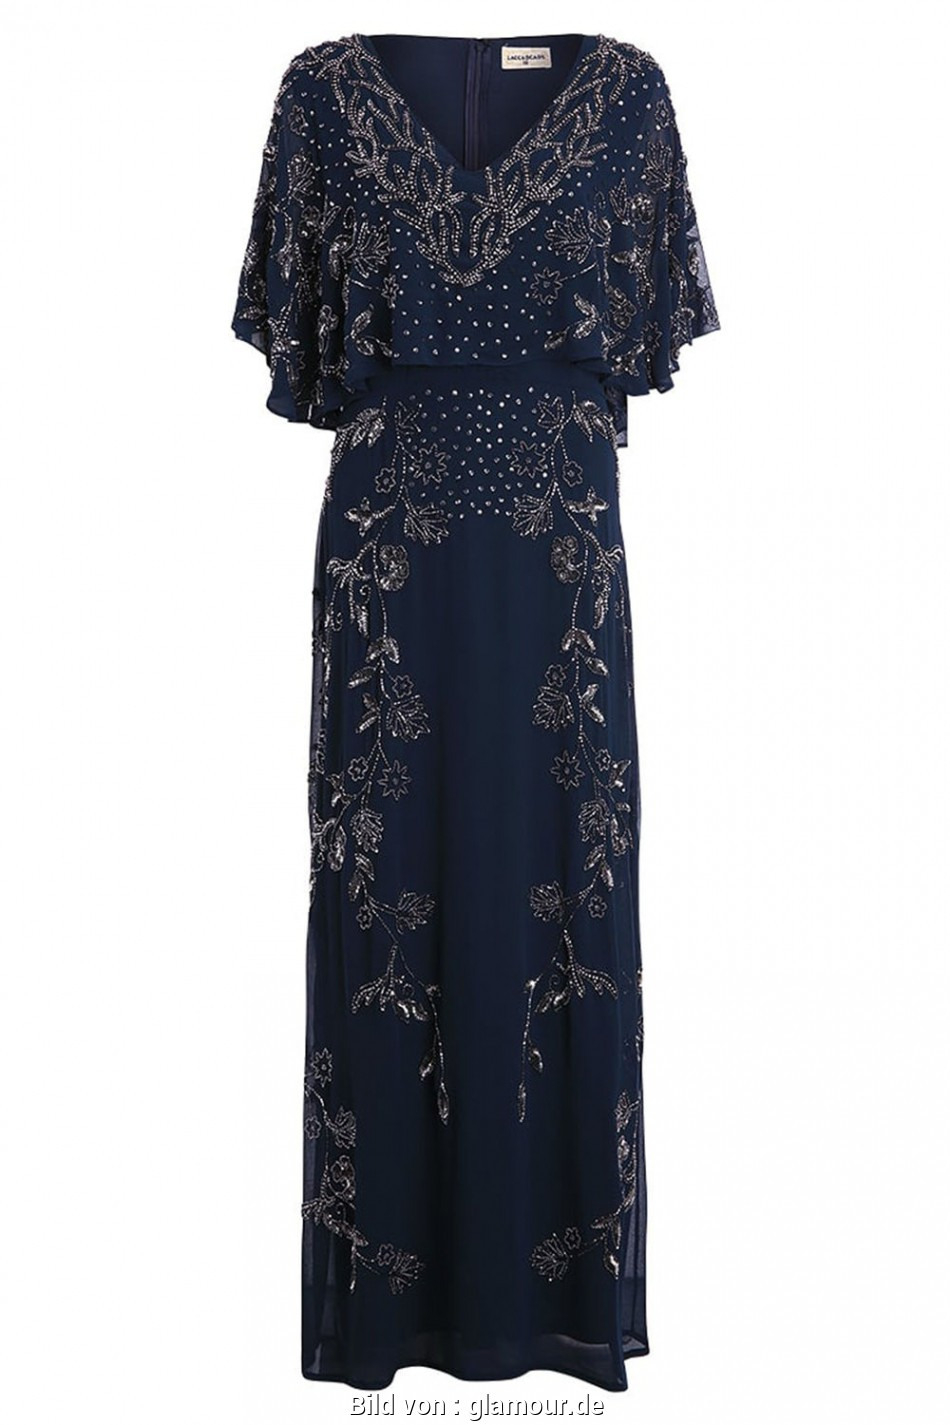 11 Spektakulär Abendkleider Zalando Stylish - Abendkleid